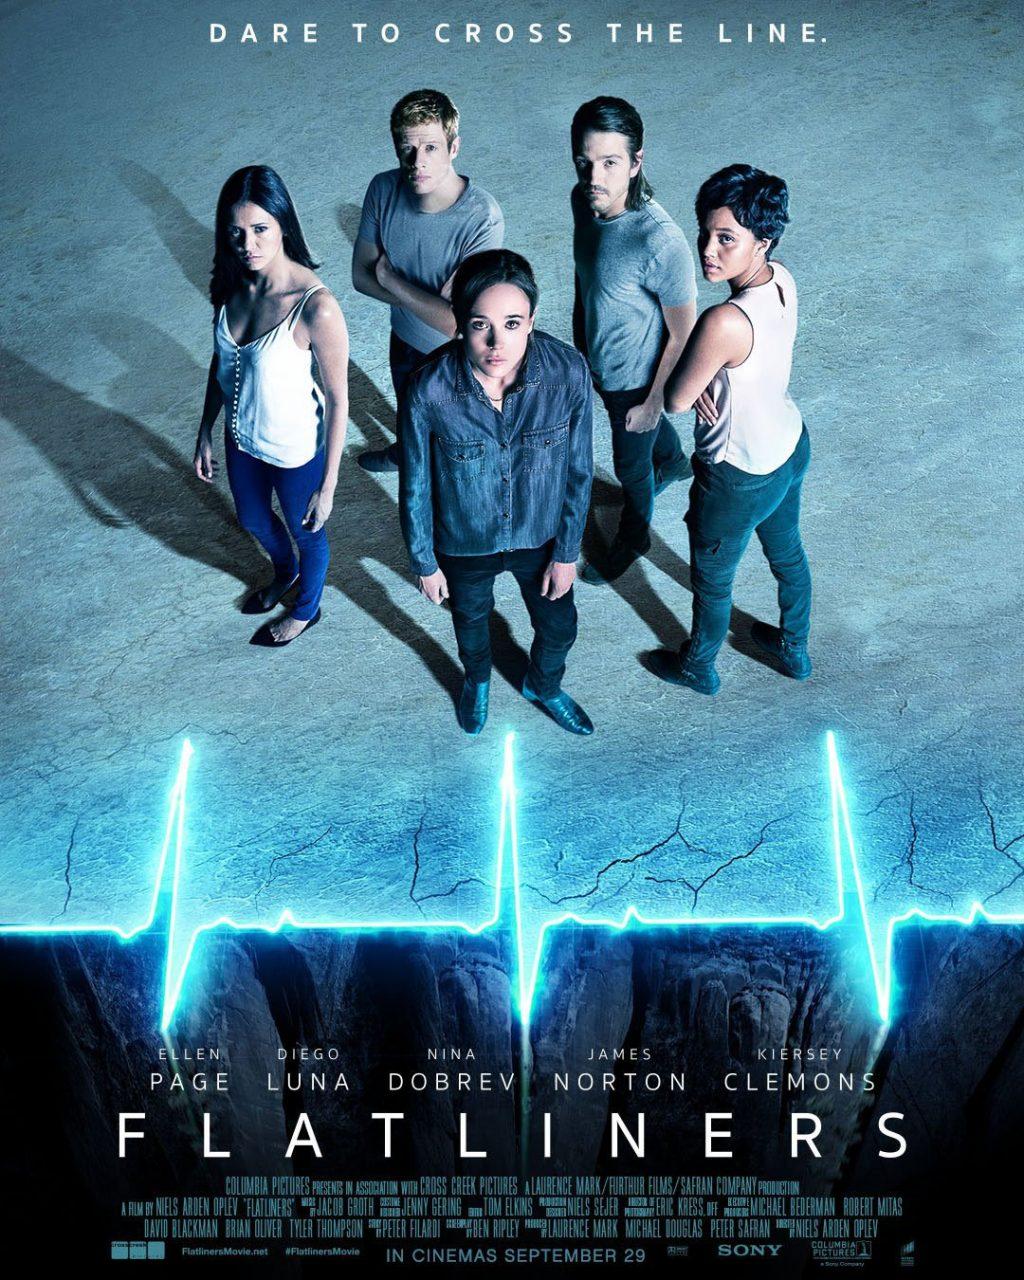 Flatliners New Film